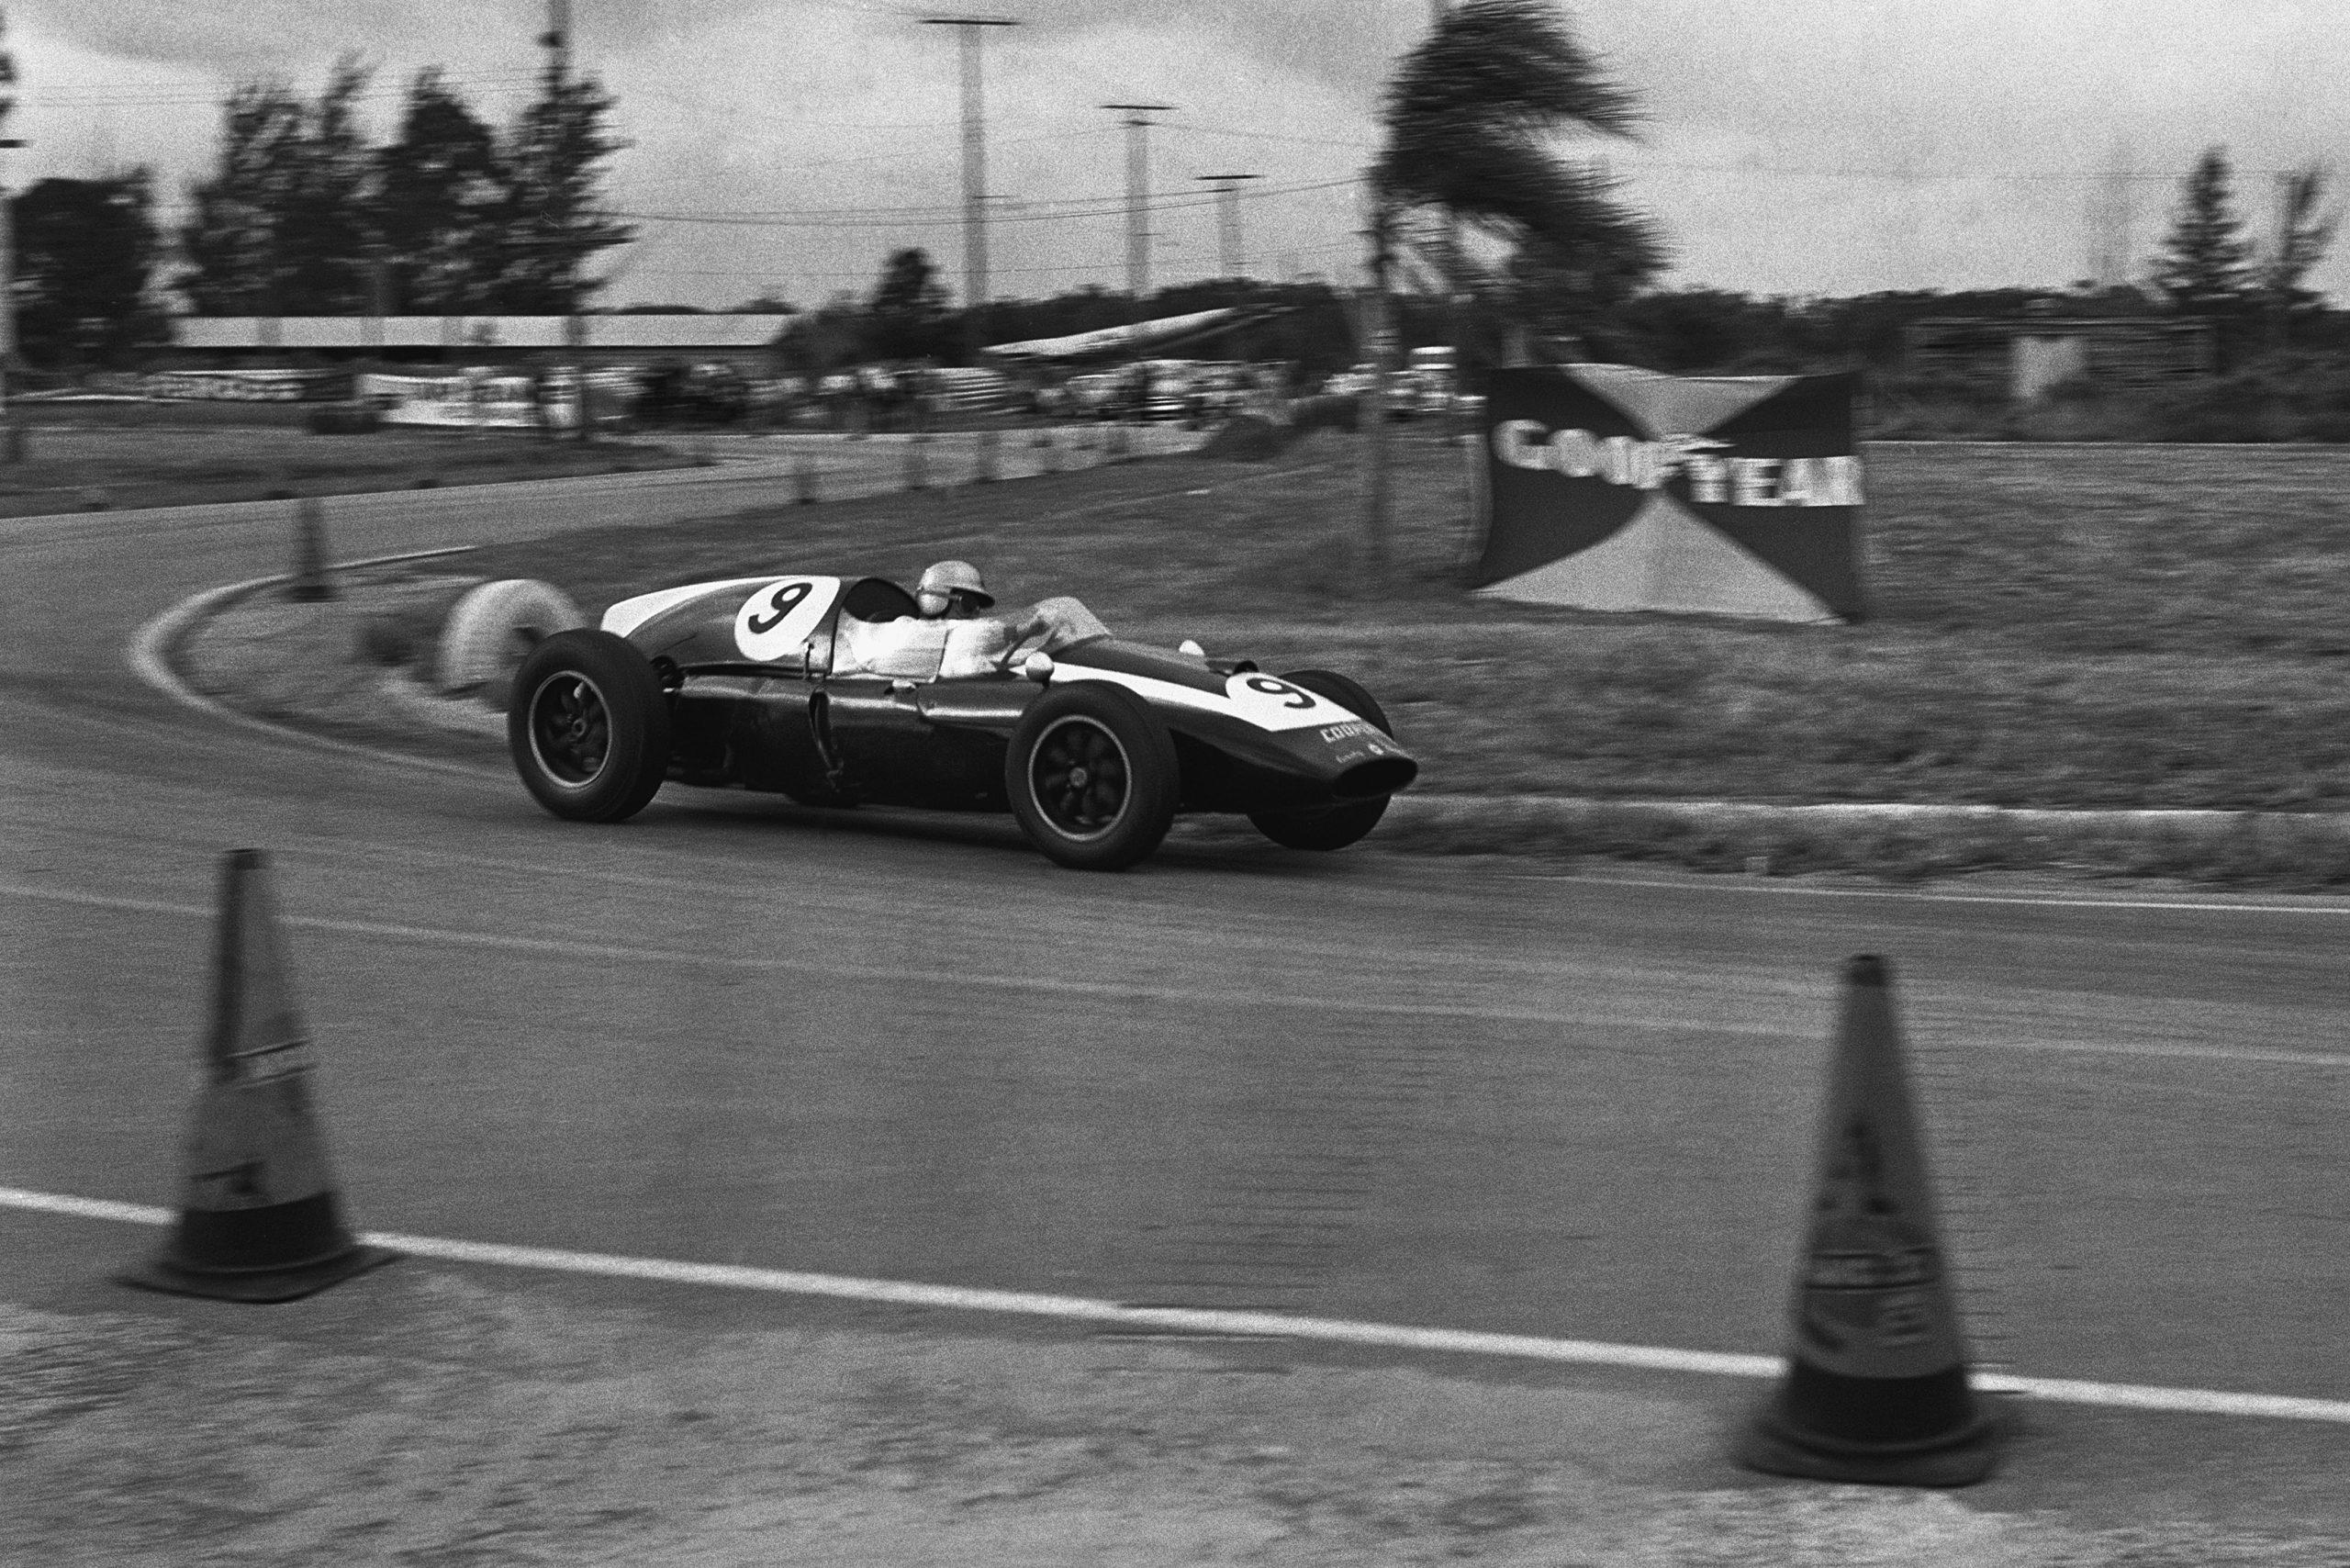 Bruce McLaren in his Cooper T45-Climax.